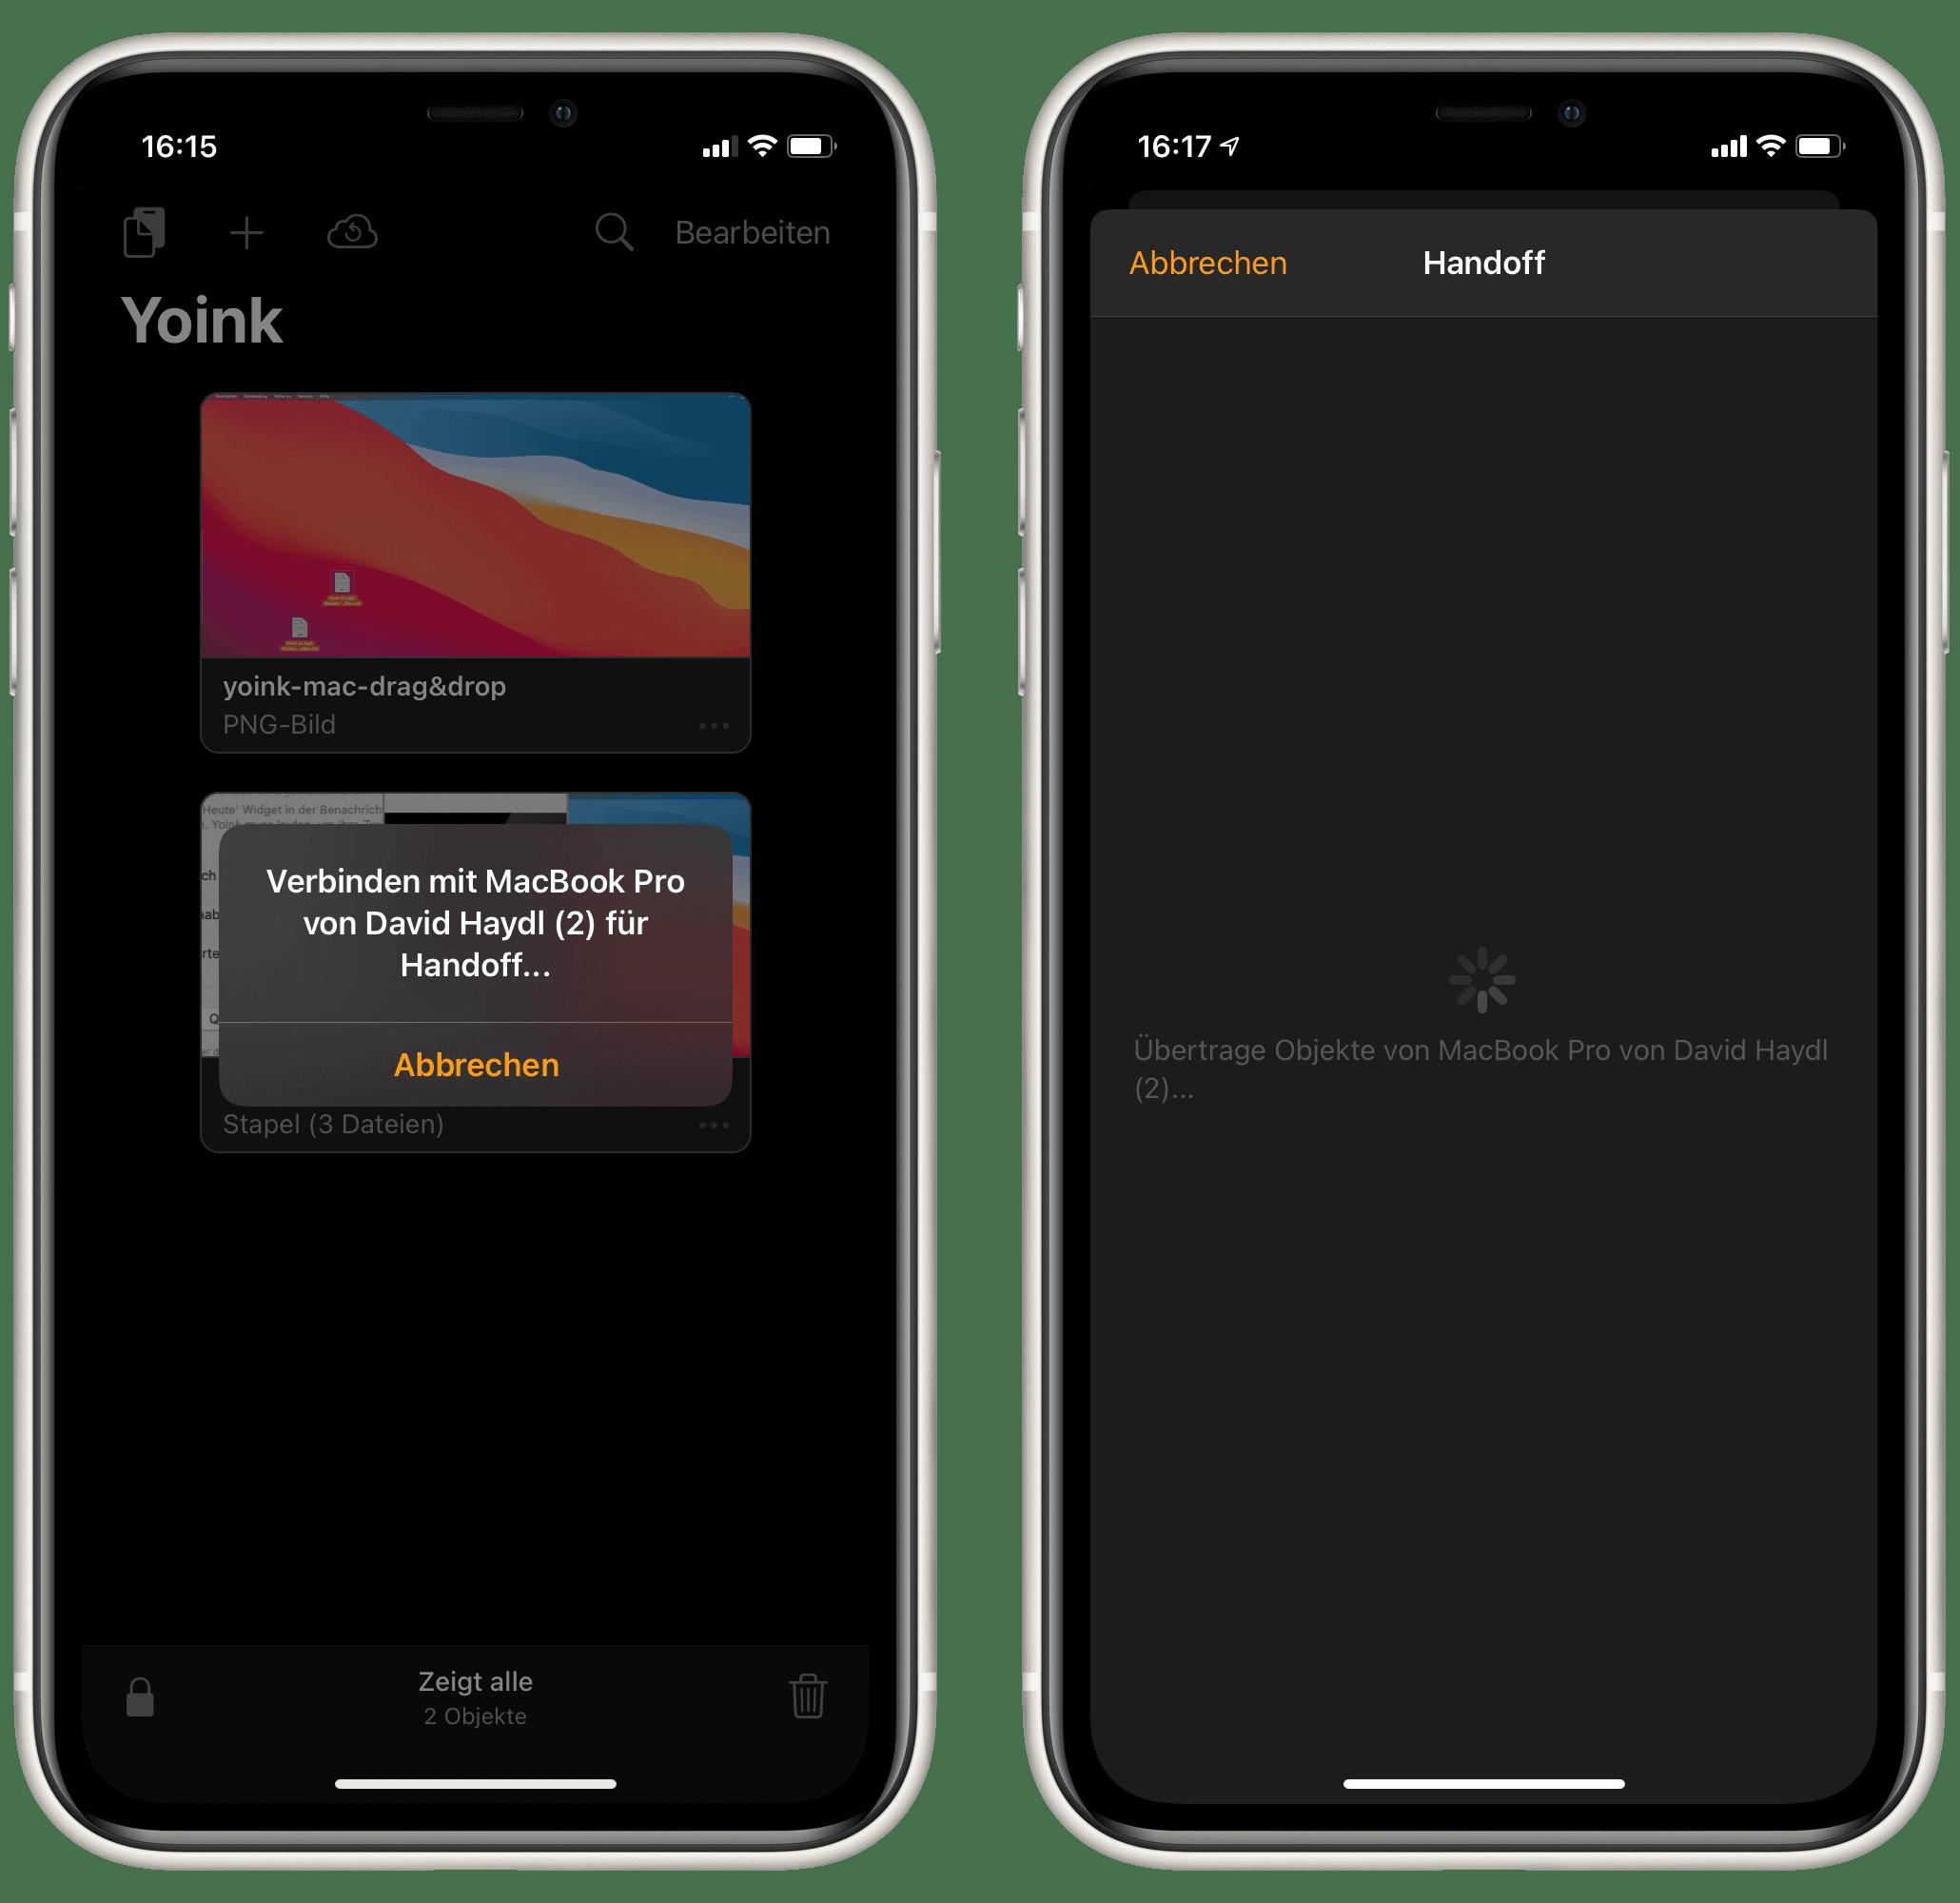 Yoink Handoff iOS